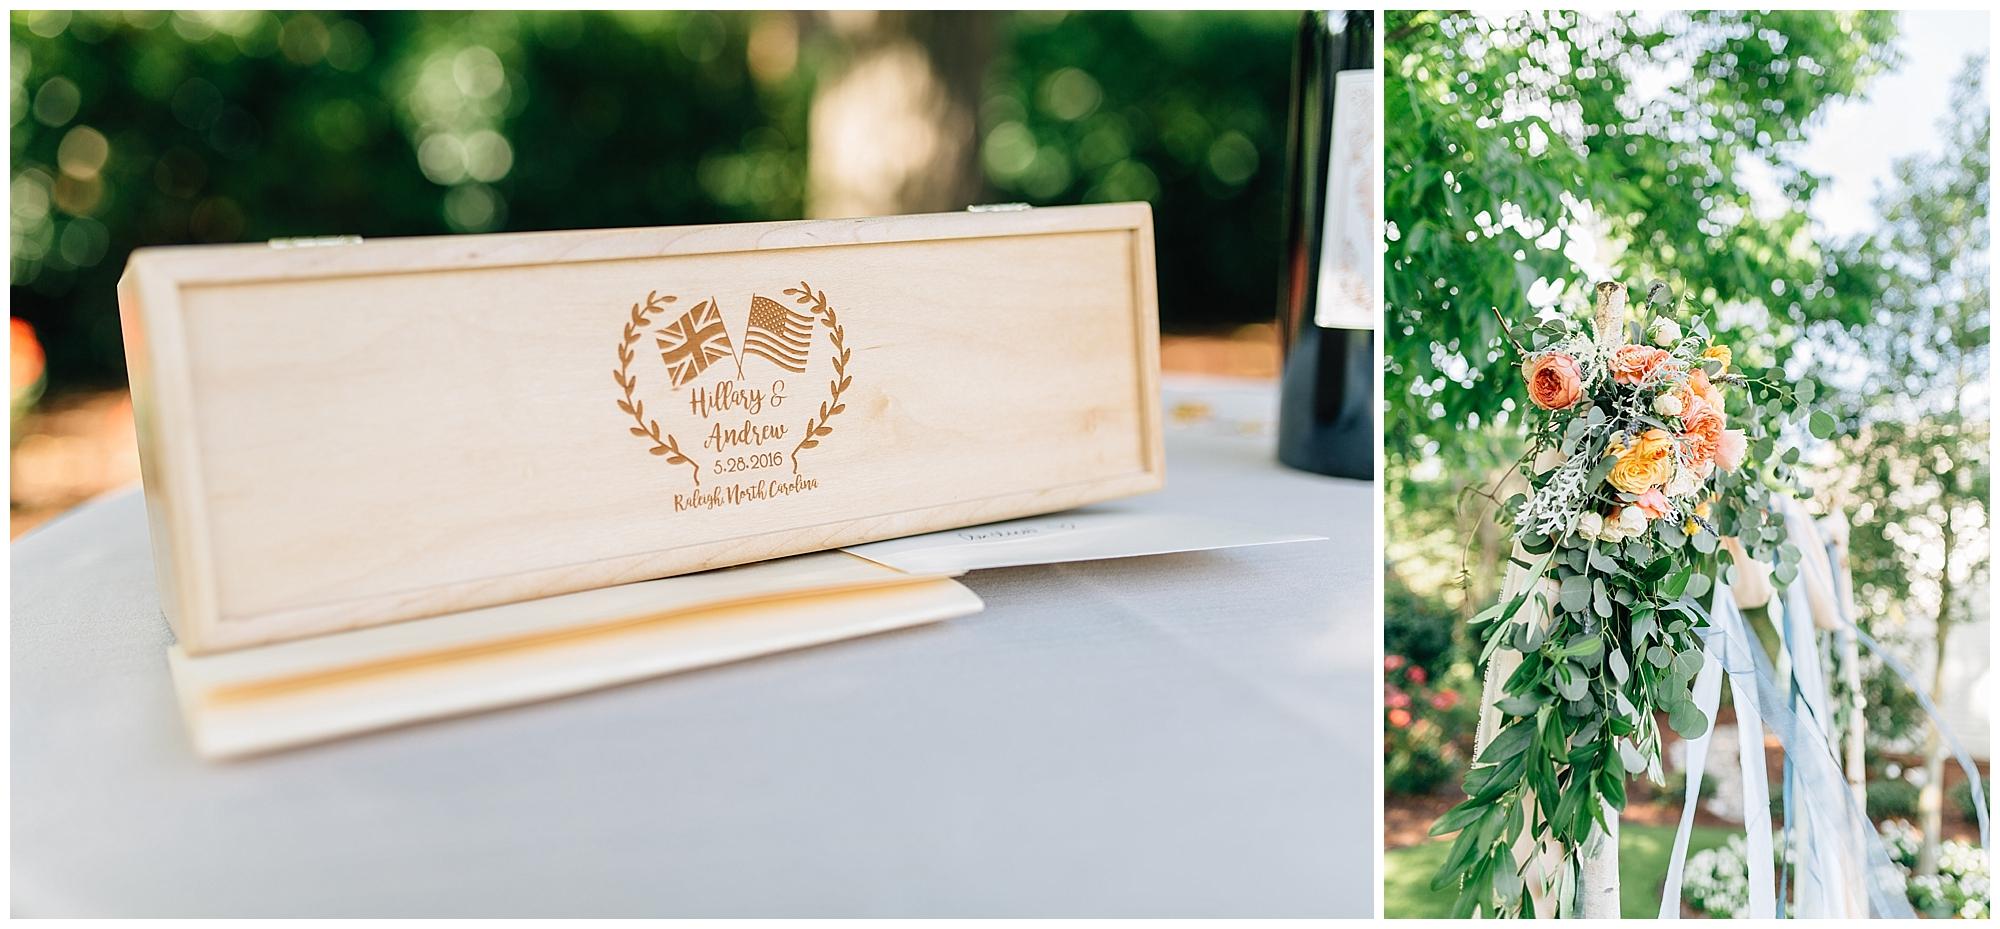 Merrimon-Wynne-Raleigh-Wedding-16.jpg